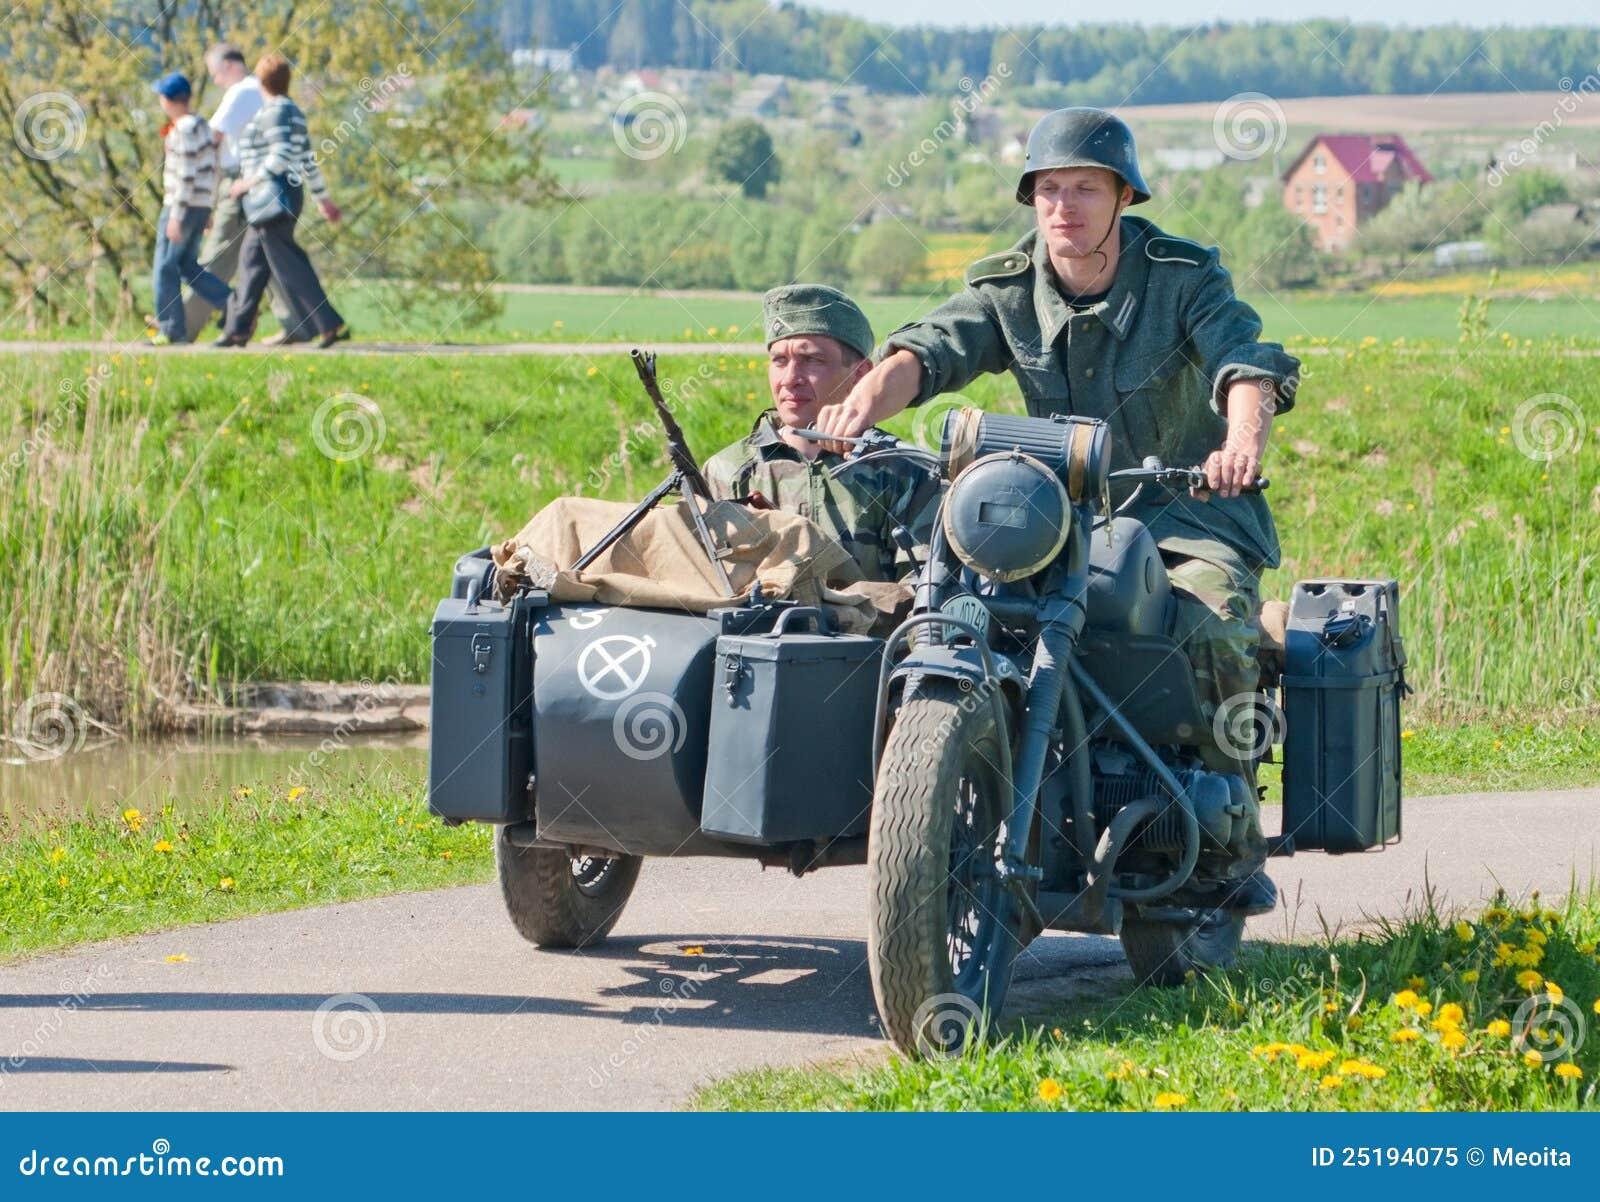 Engine Stand Designs : Bmw r motorcycle patrol editorial image